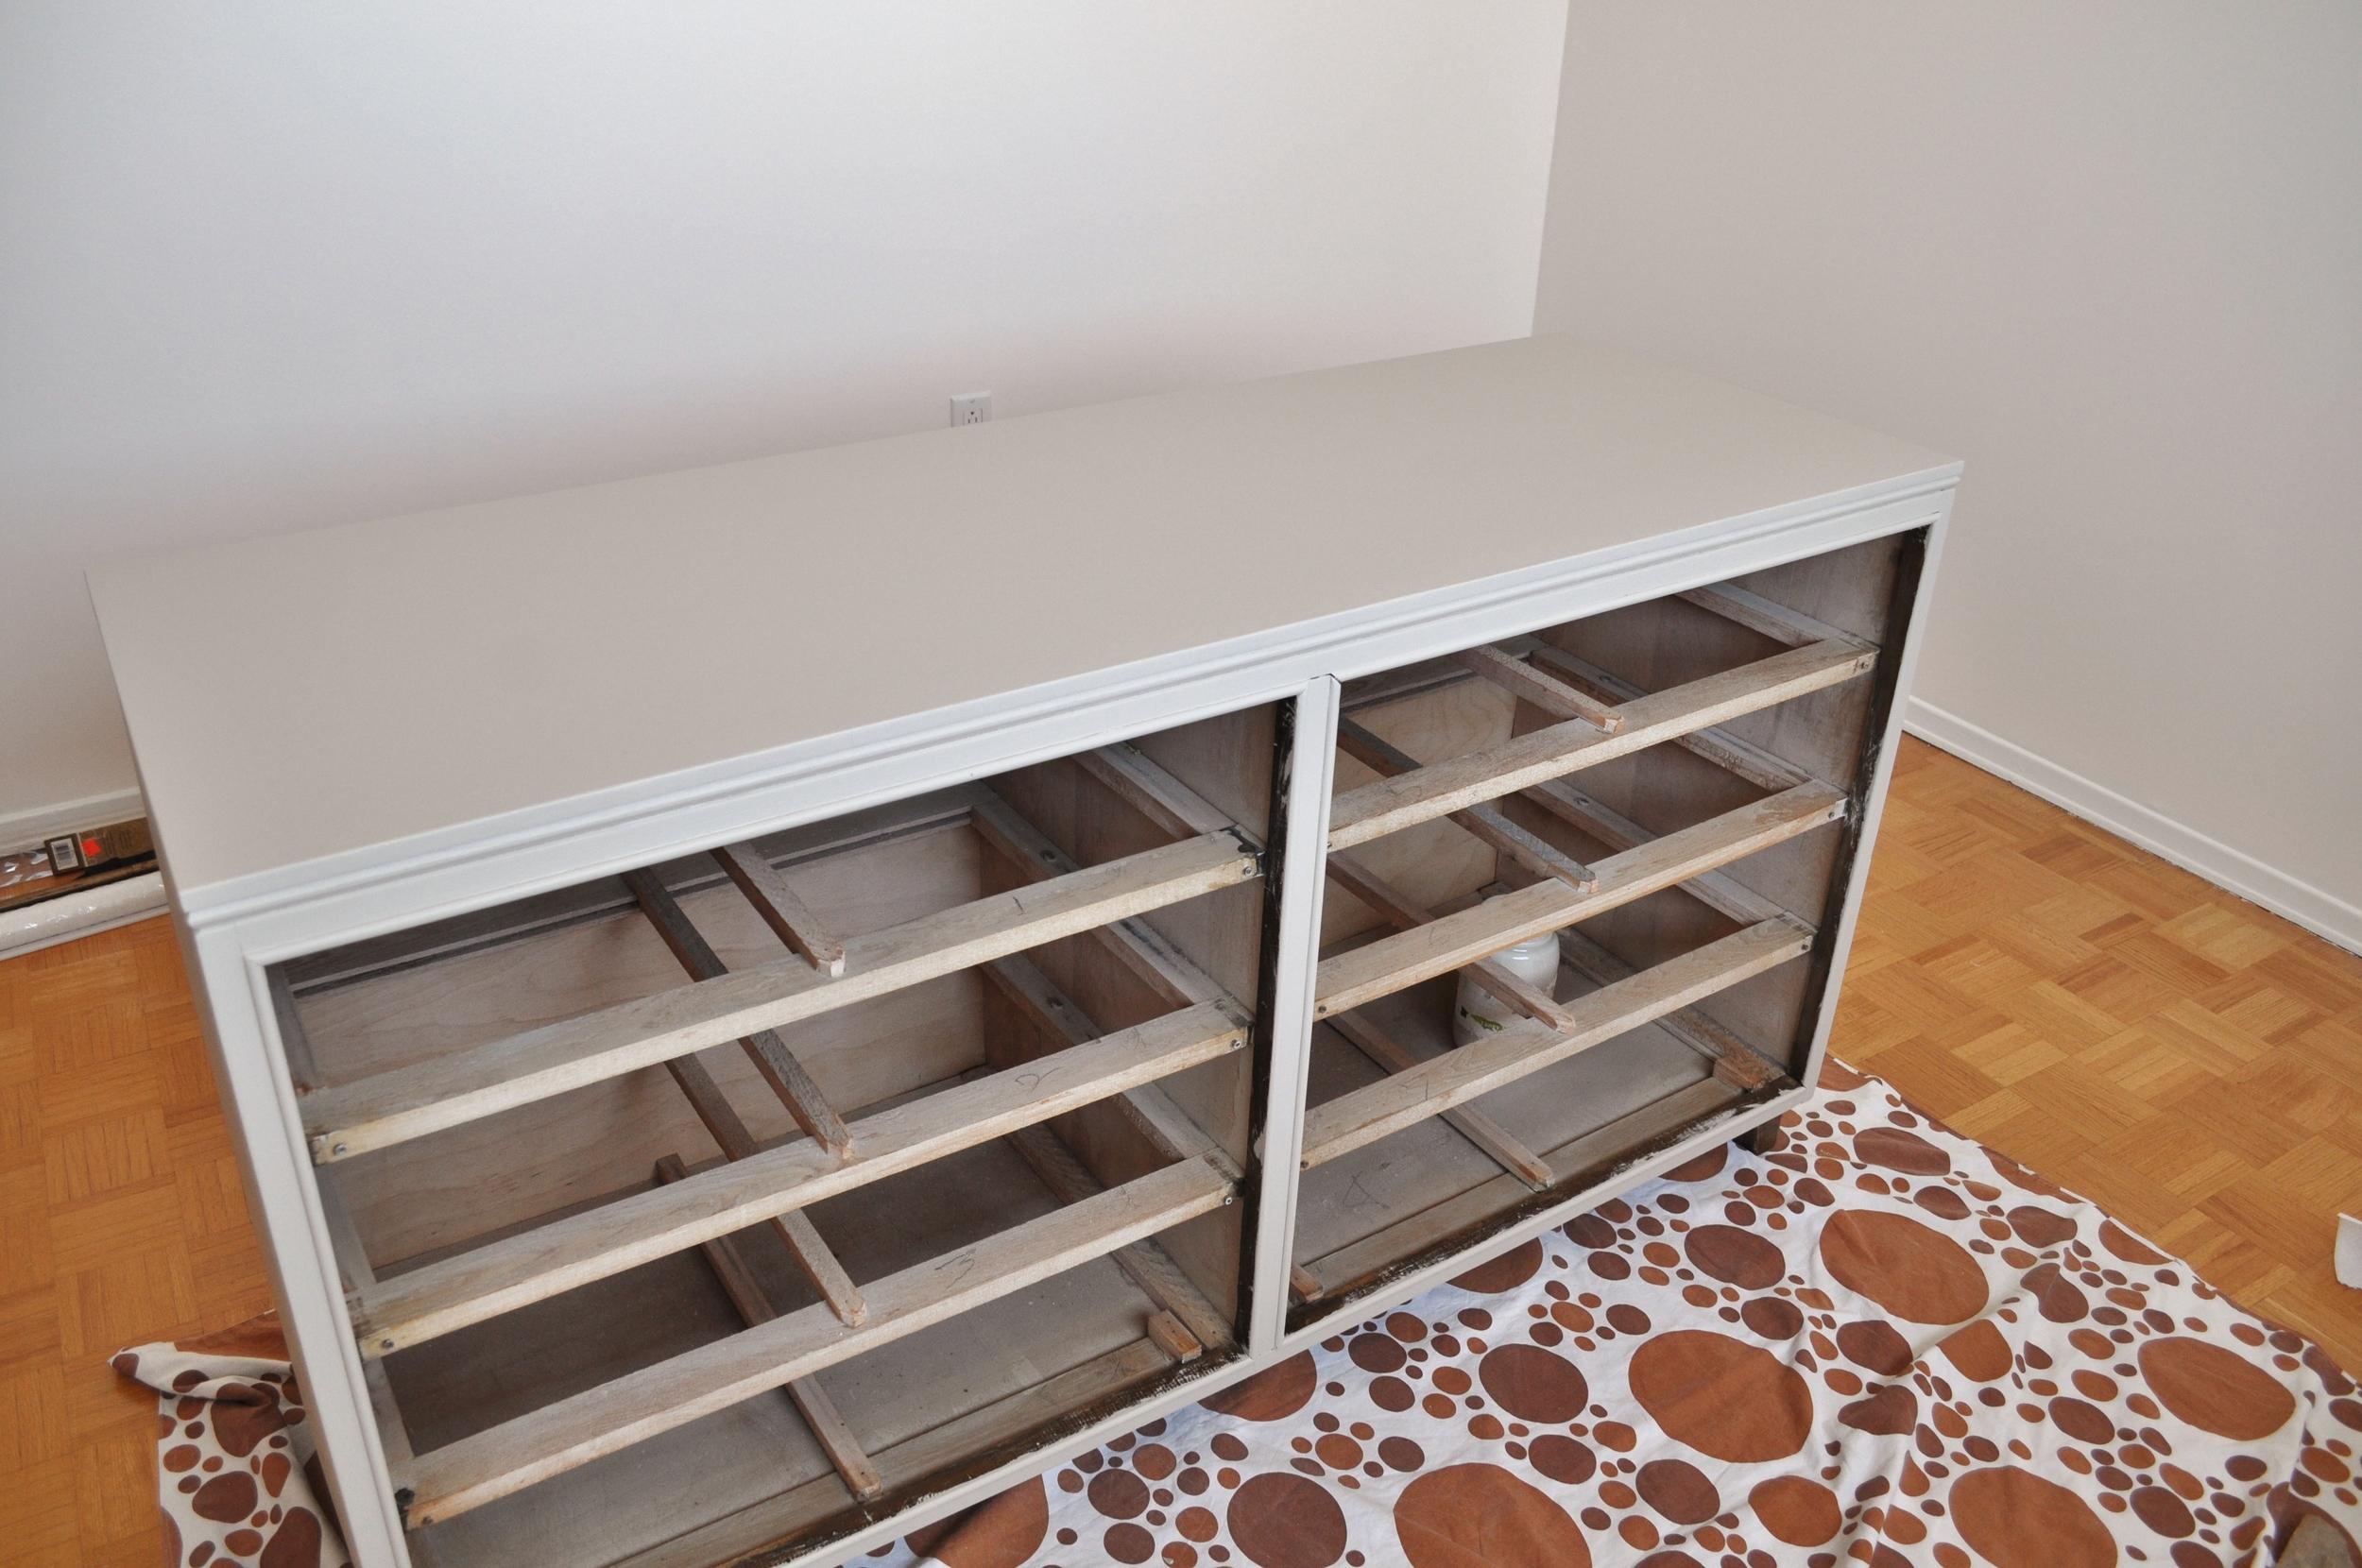 Dresser, First Paint Color